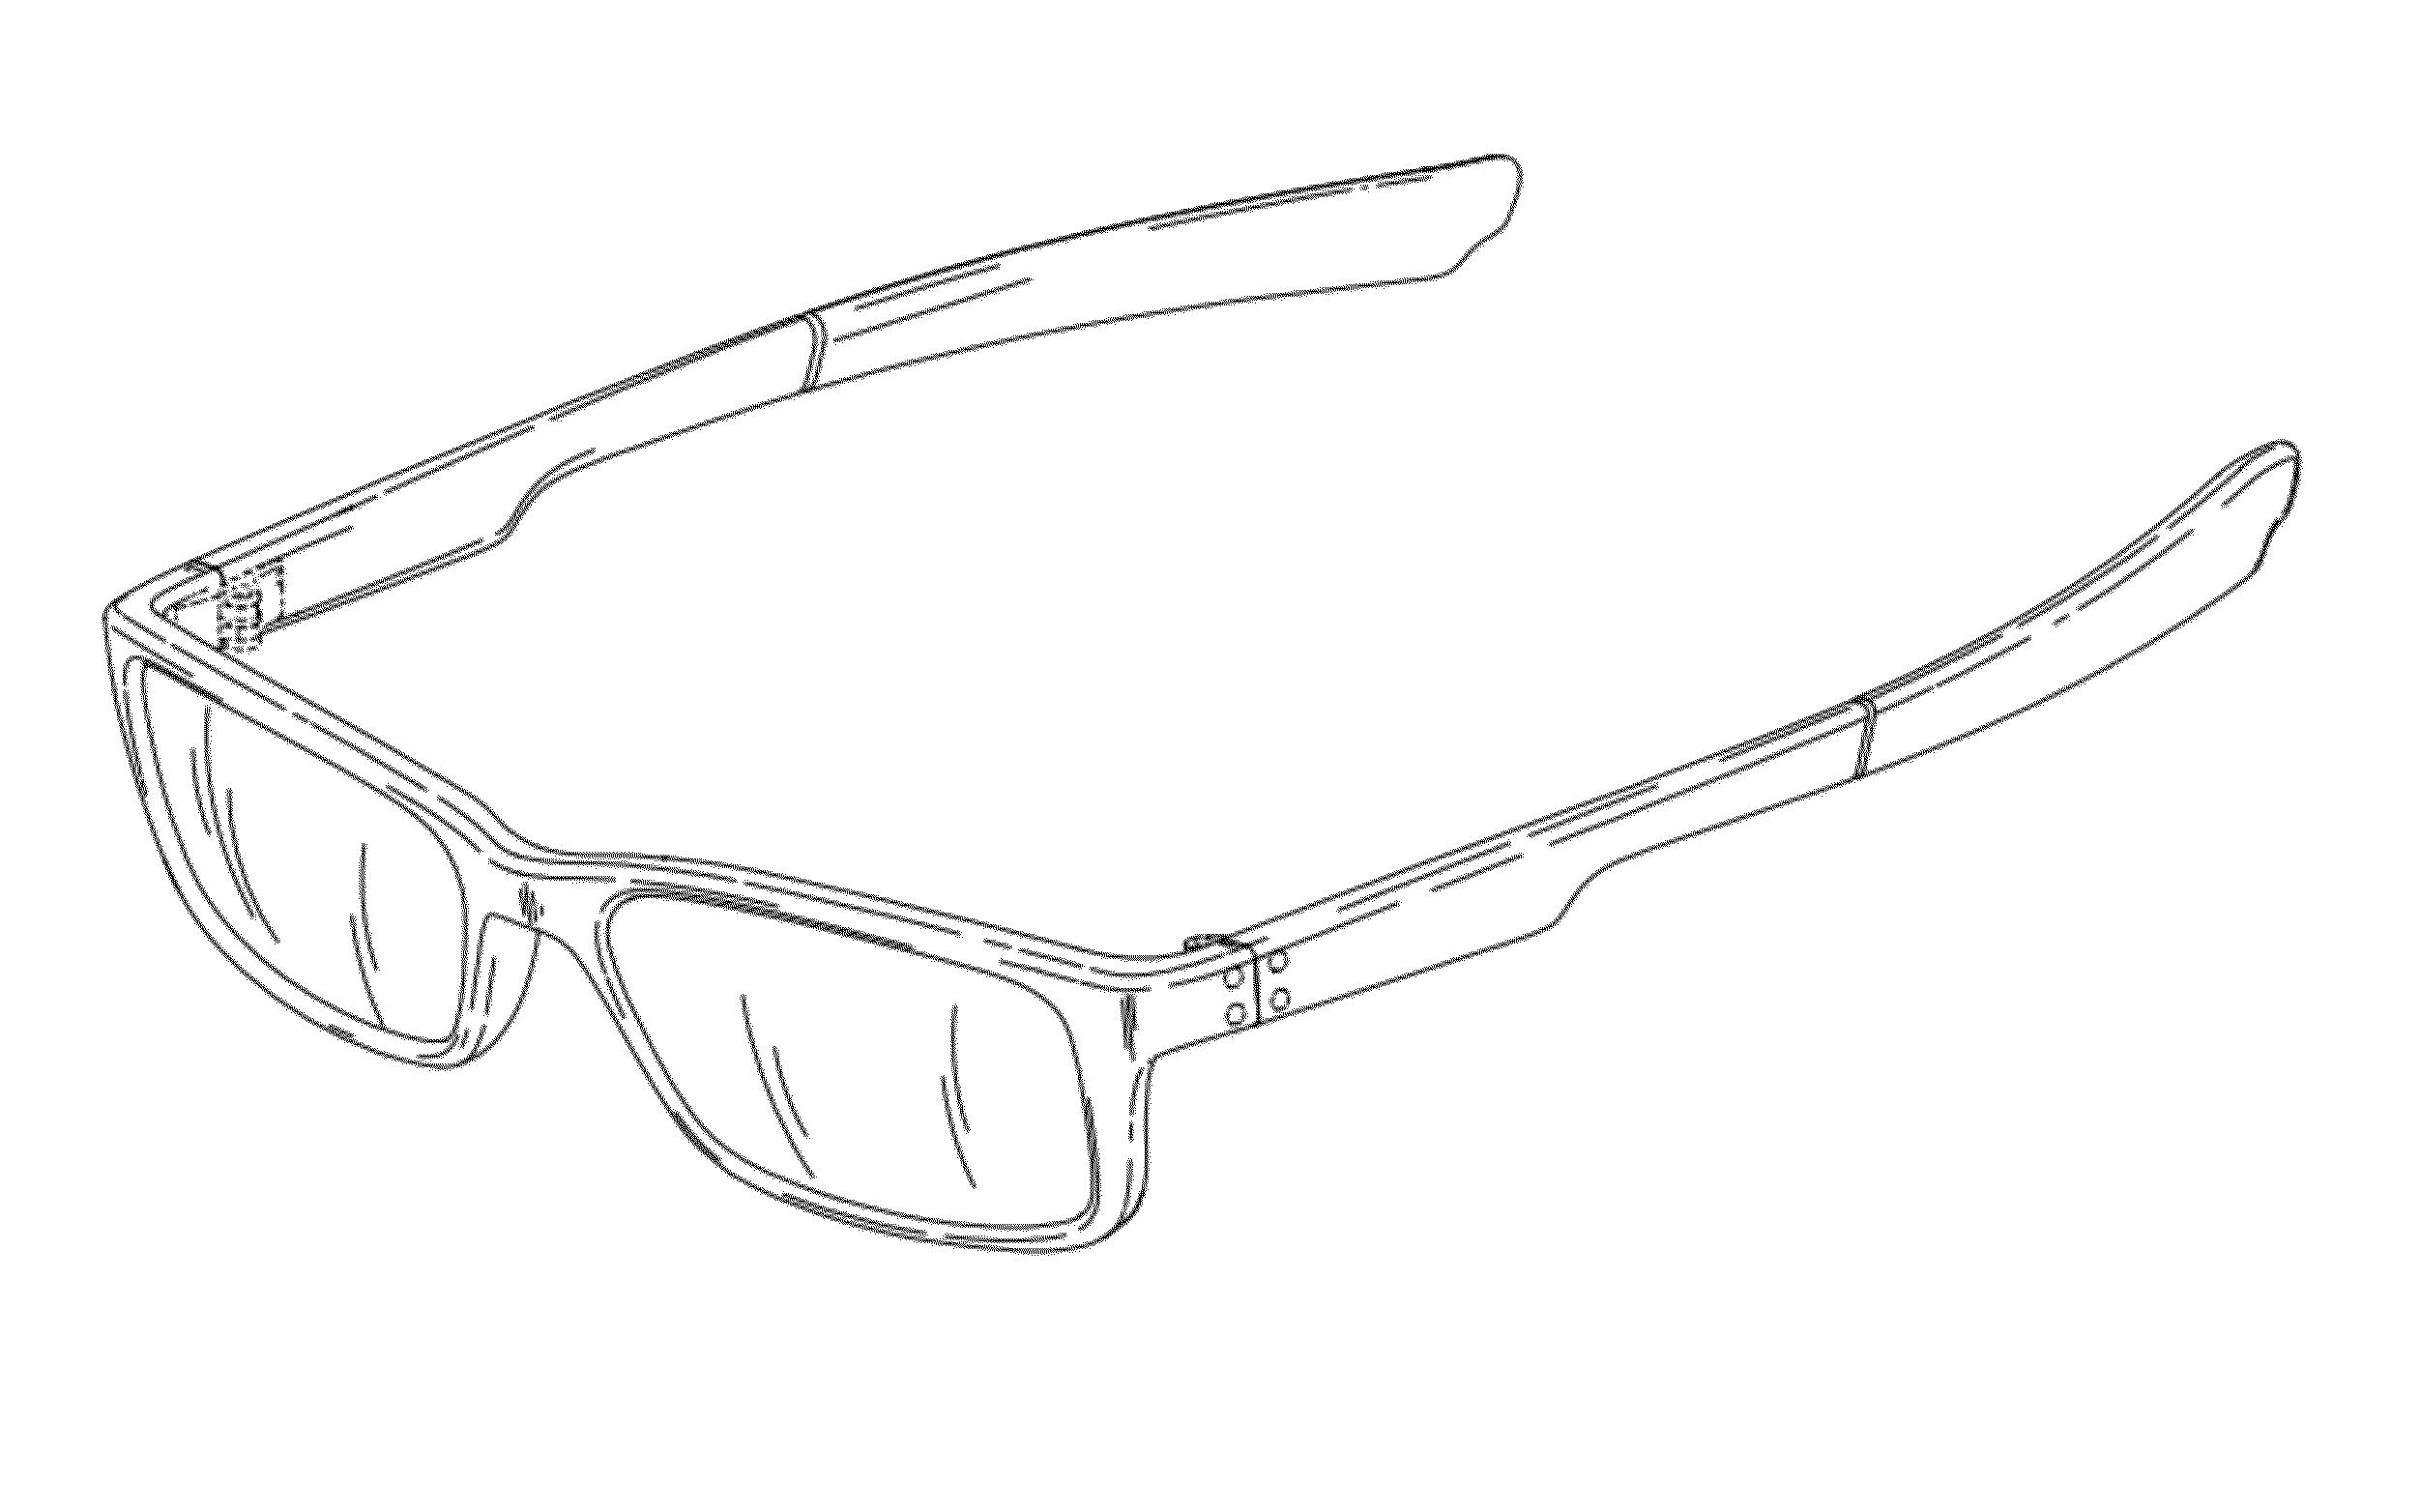 buy eyeglass frames online  usd662124 - eyeglass